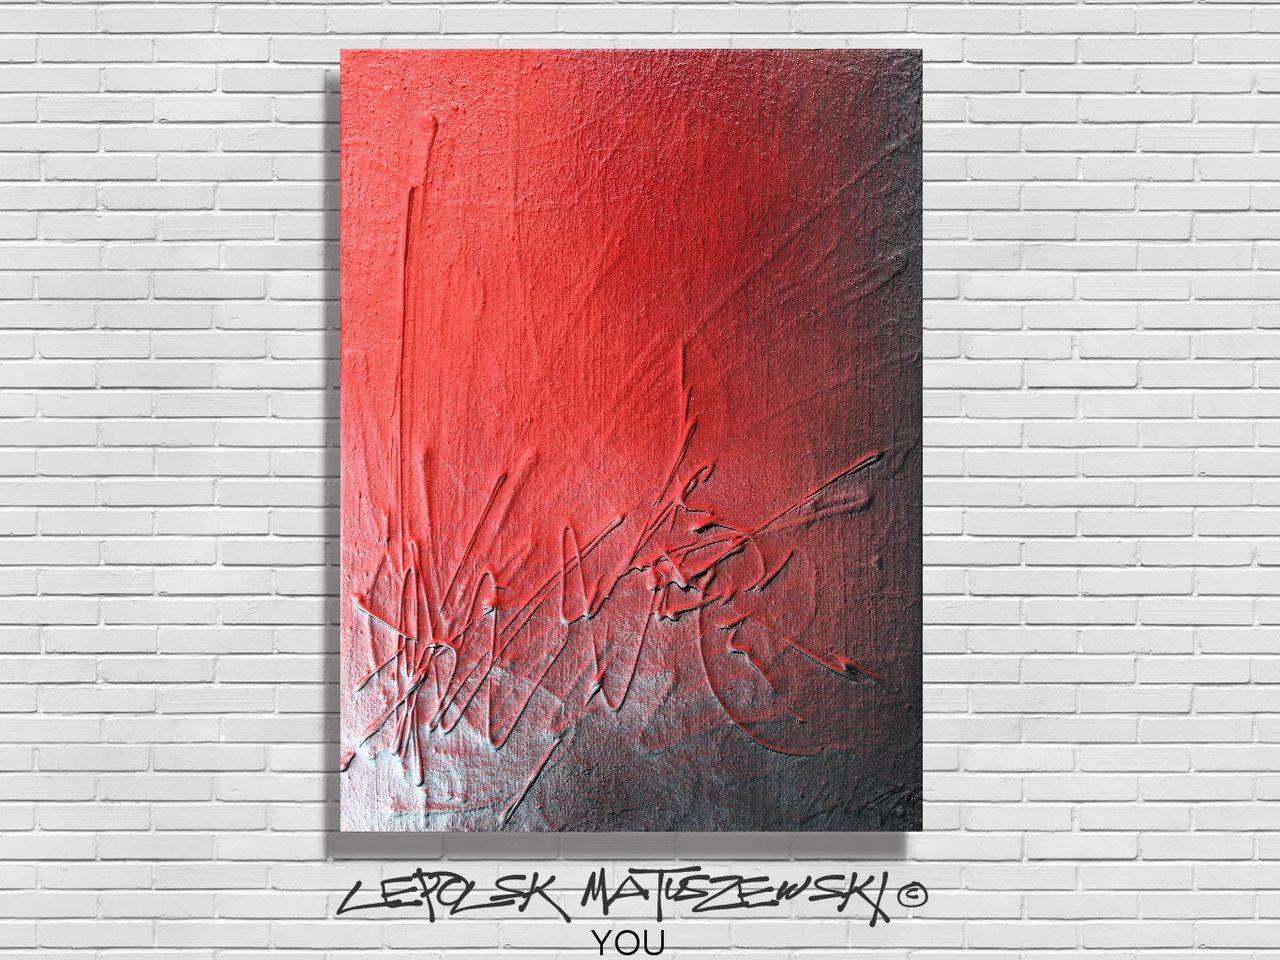 LEPOLSK MATUSZEWSKI YOU  Expressionnisme abstrait Lepolsk Matuszewski